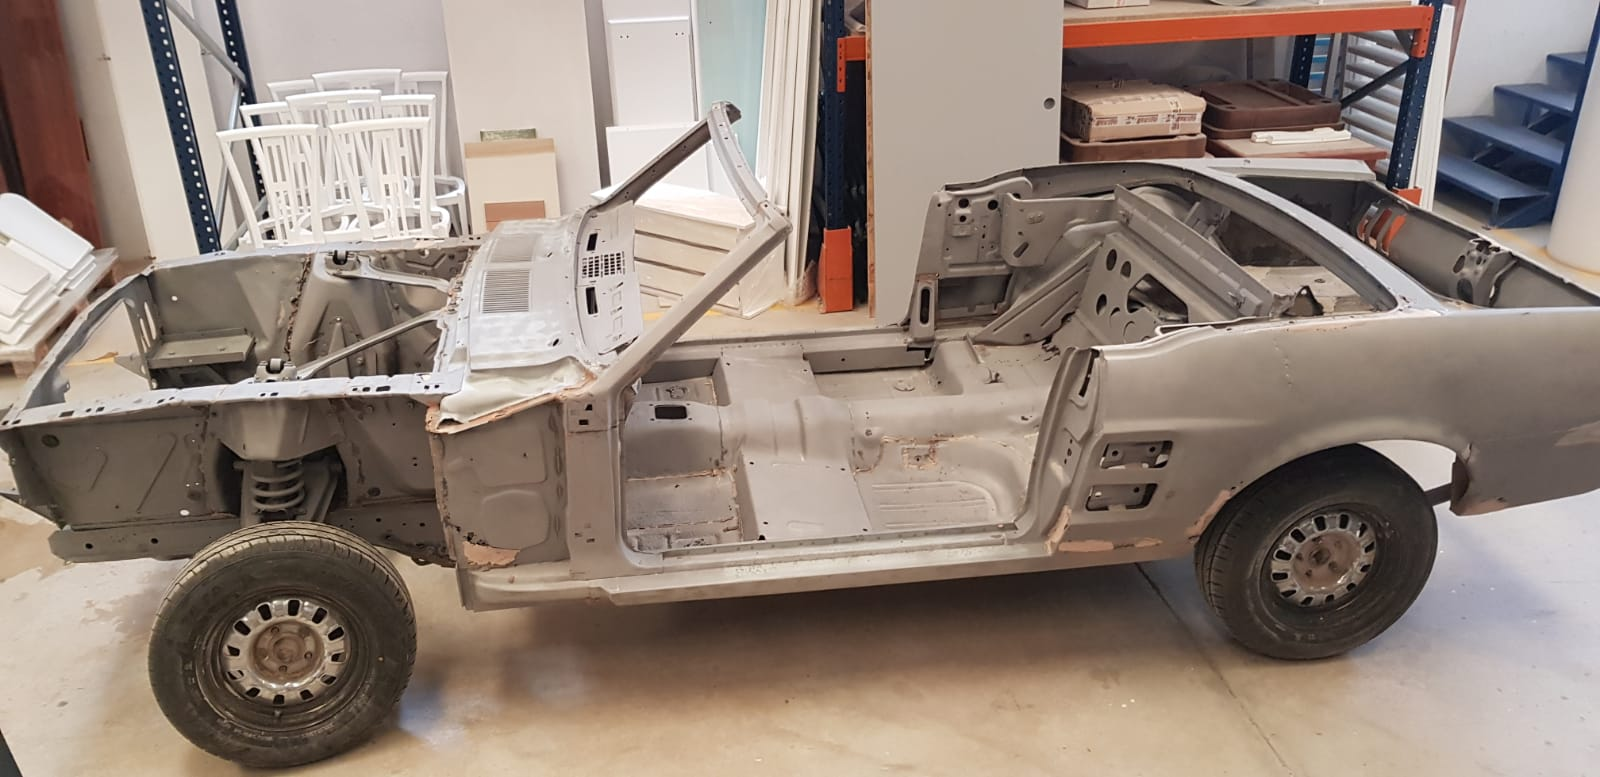 Arenado de coche Mustang vehículo clásico